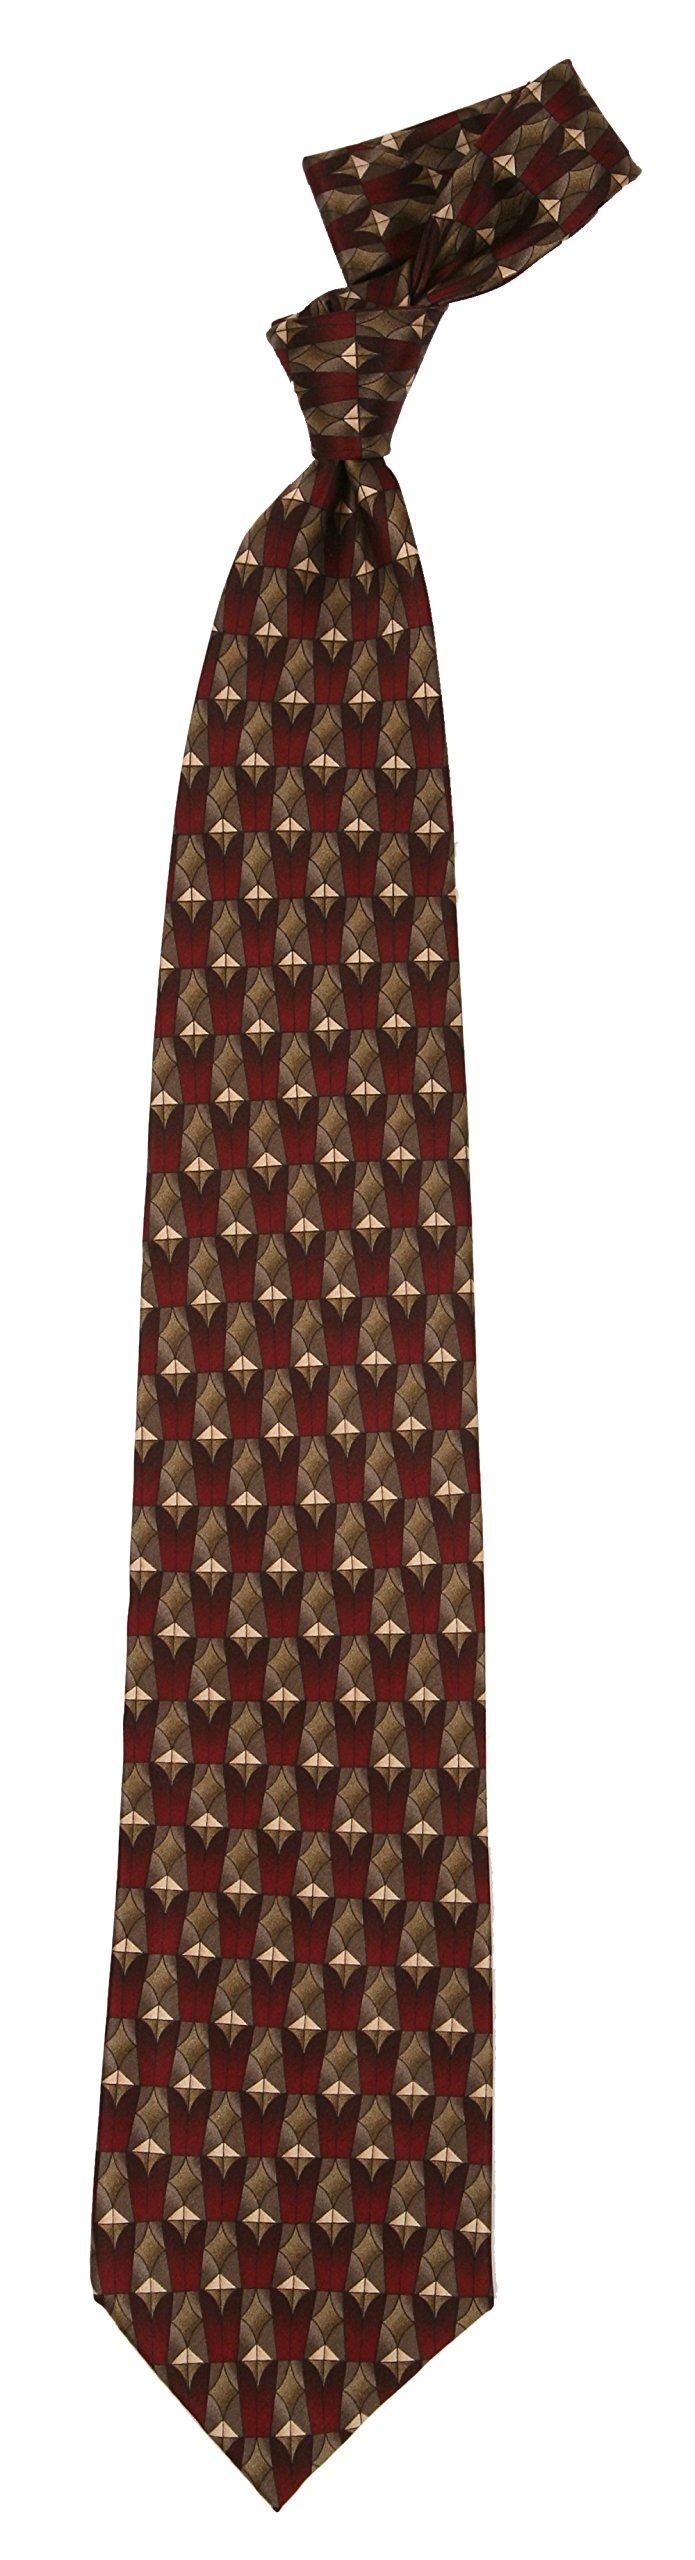 Love Lakeside-Men's 100% Silk, X-Long, Extra Long, Big and Tall Tie Burgundy Foulard